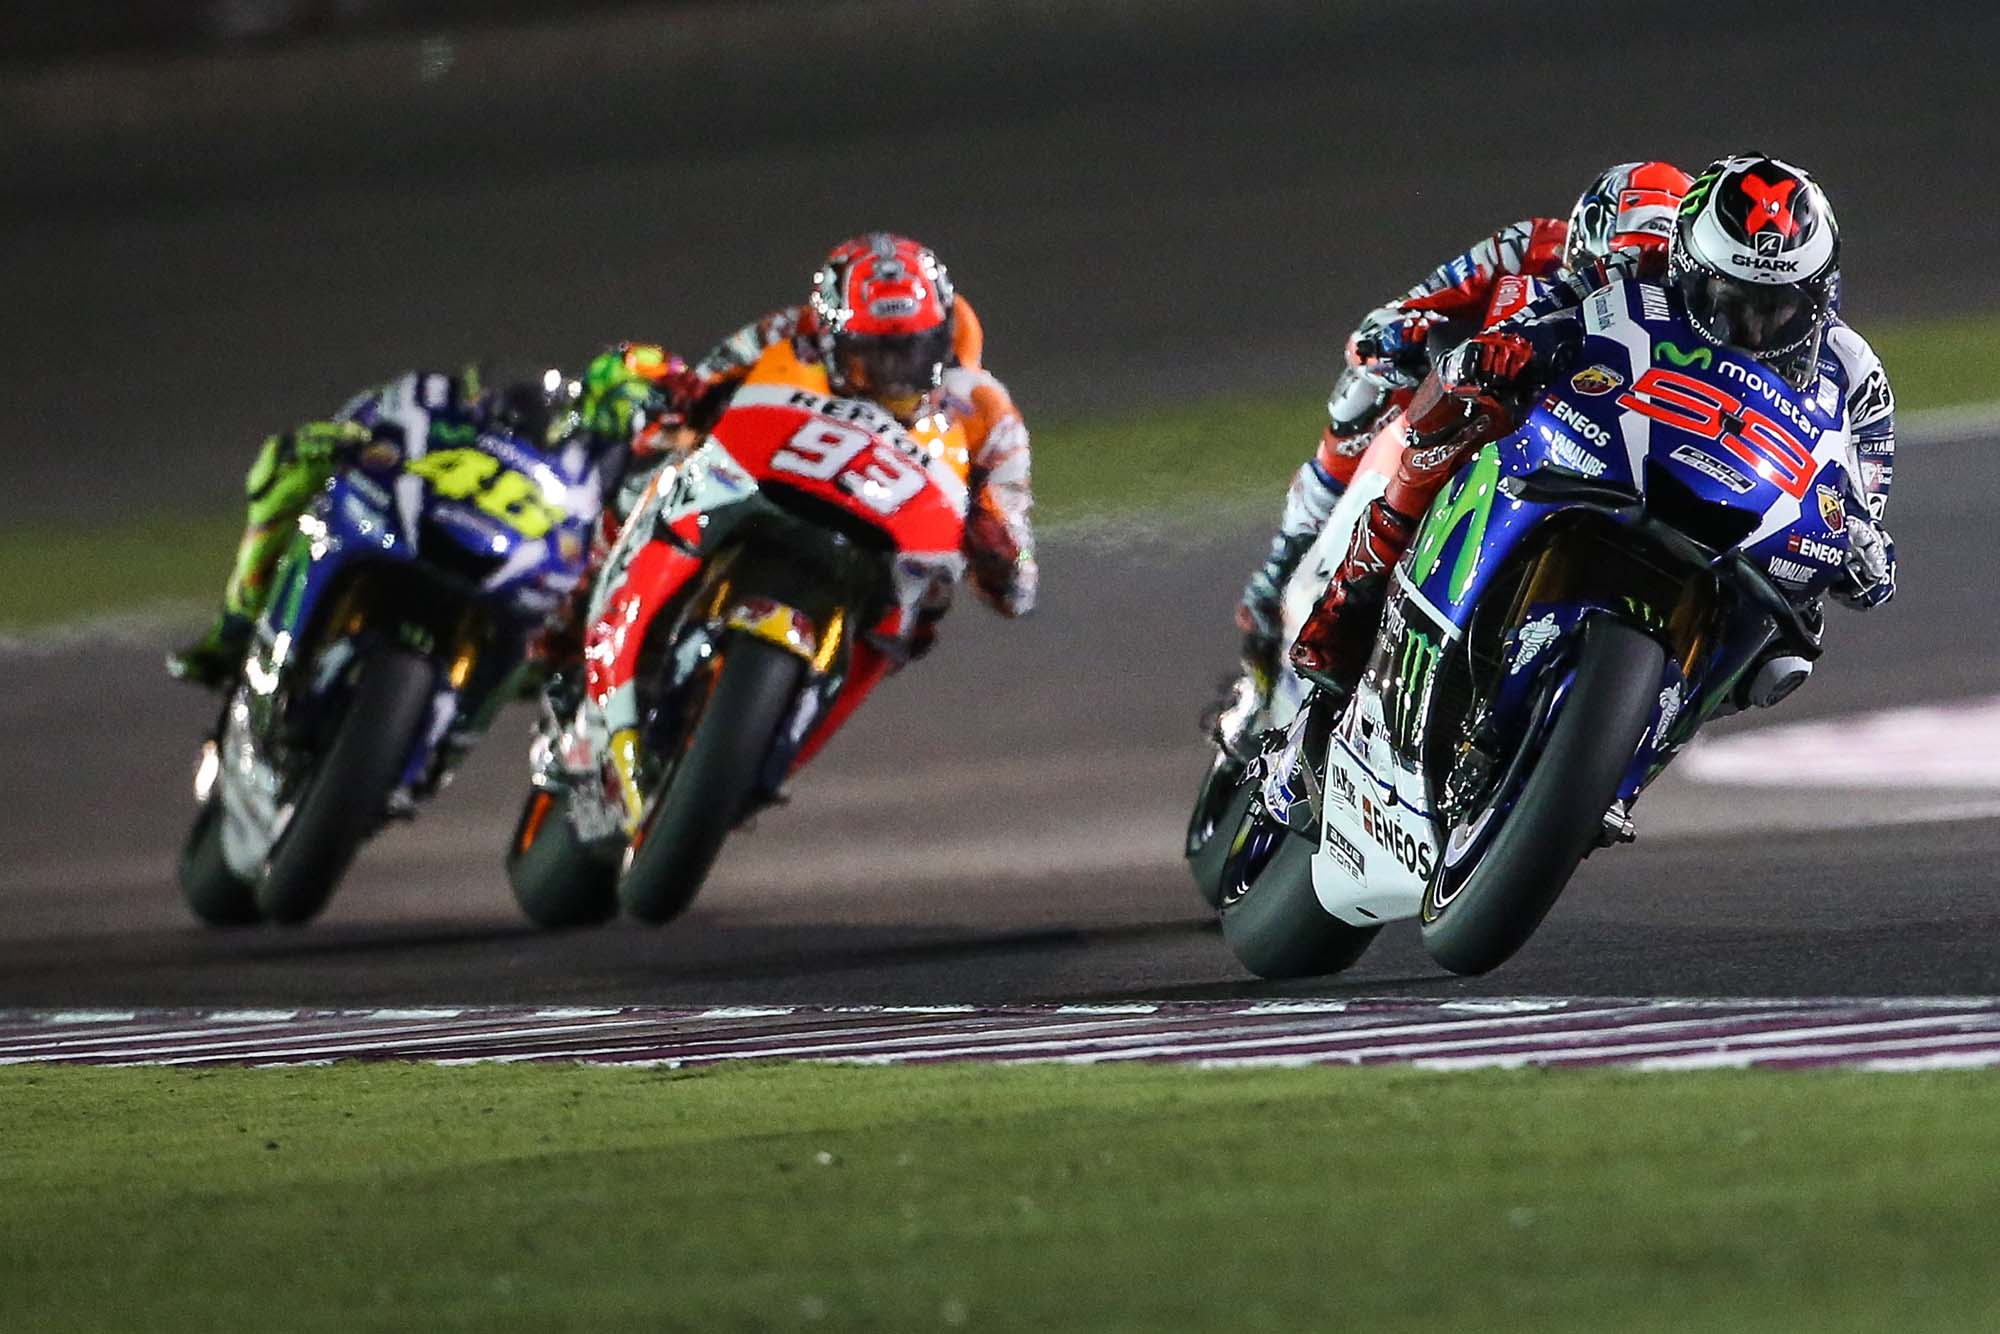 [GP] Qatar - Page 2 MotoGP-Qatar-GP-Sunday-WUP-race-CormacGP-85